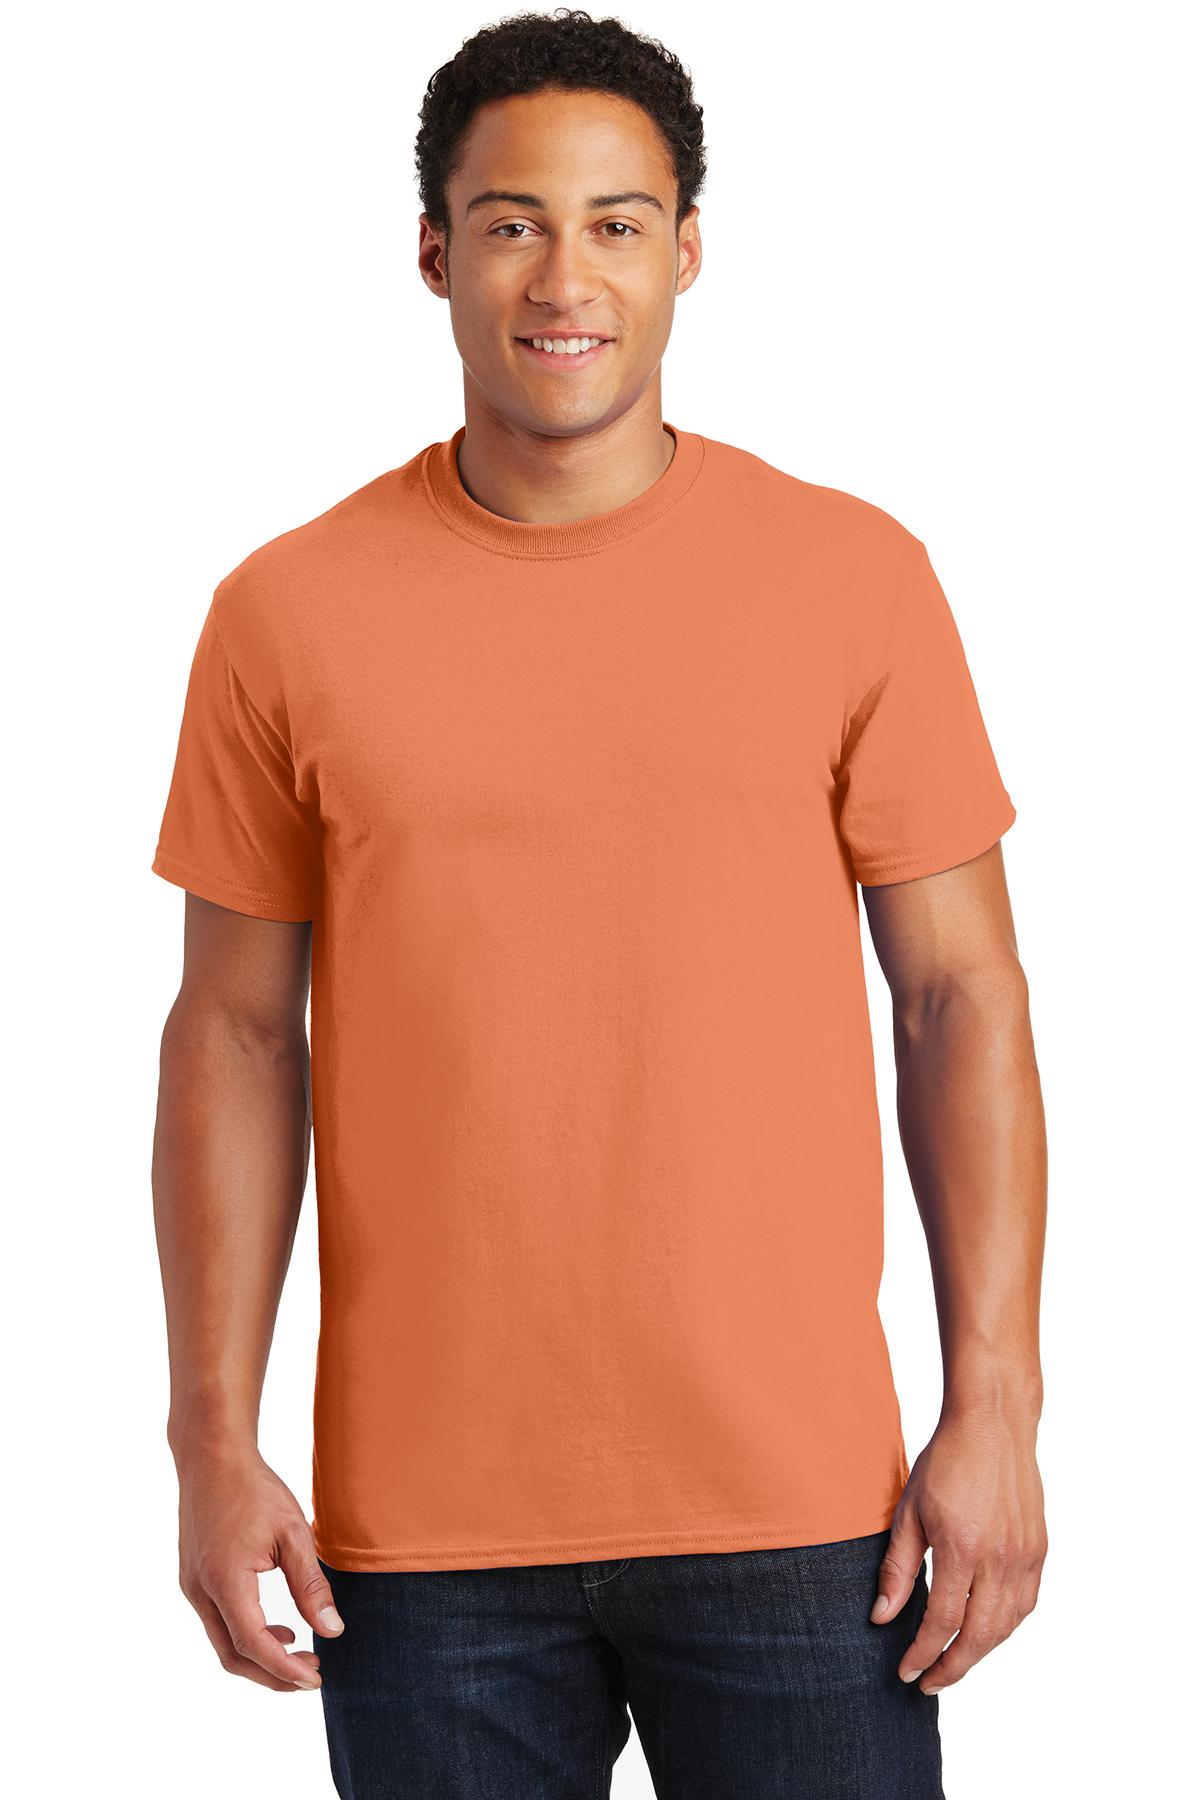 883f16c1a1b Gildan® - Ultra Cotton® 100% Cotton T-Shirt